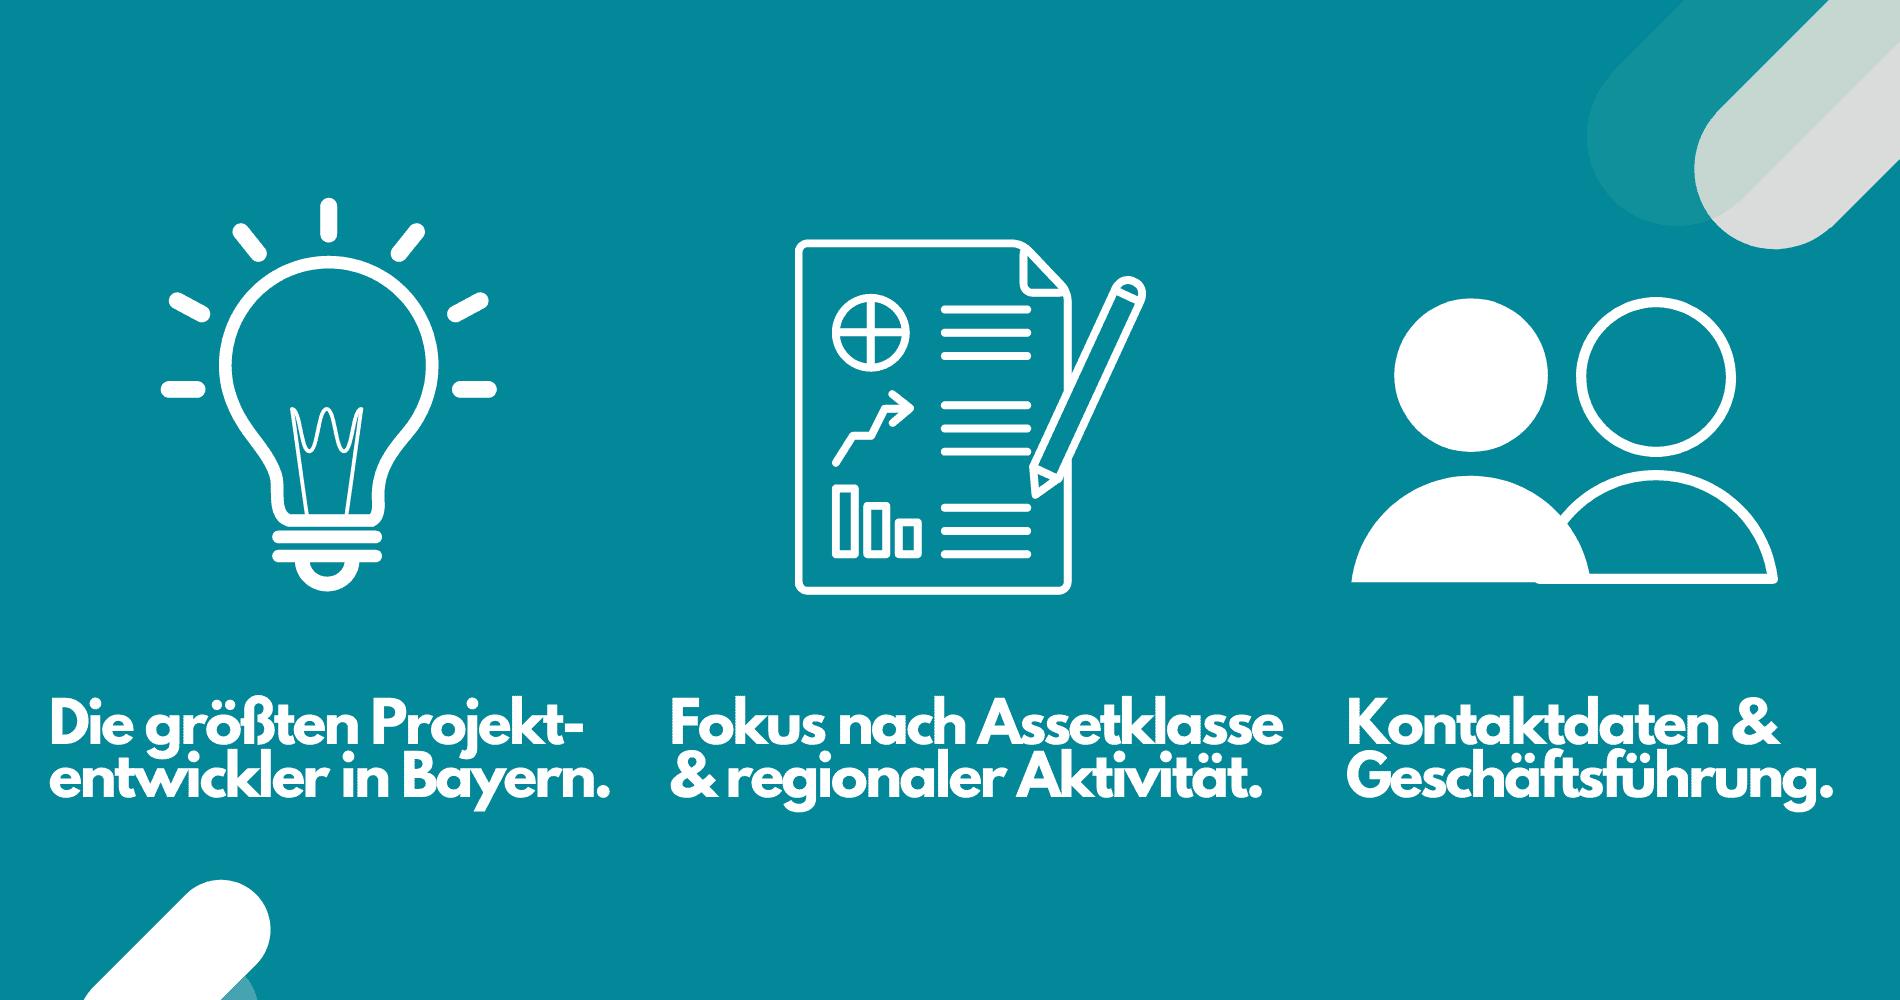 Daten Projektentwickler Bayern